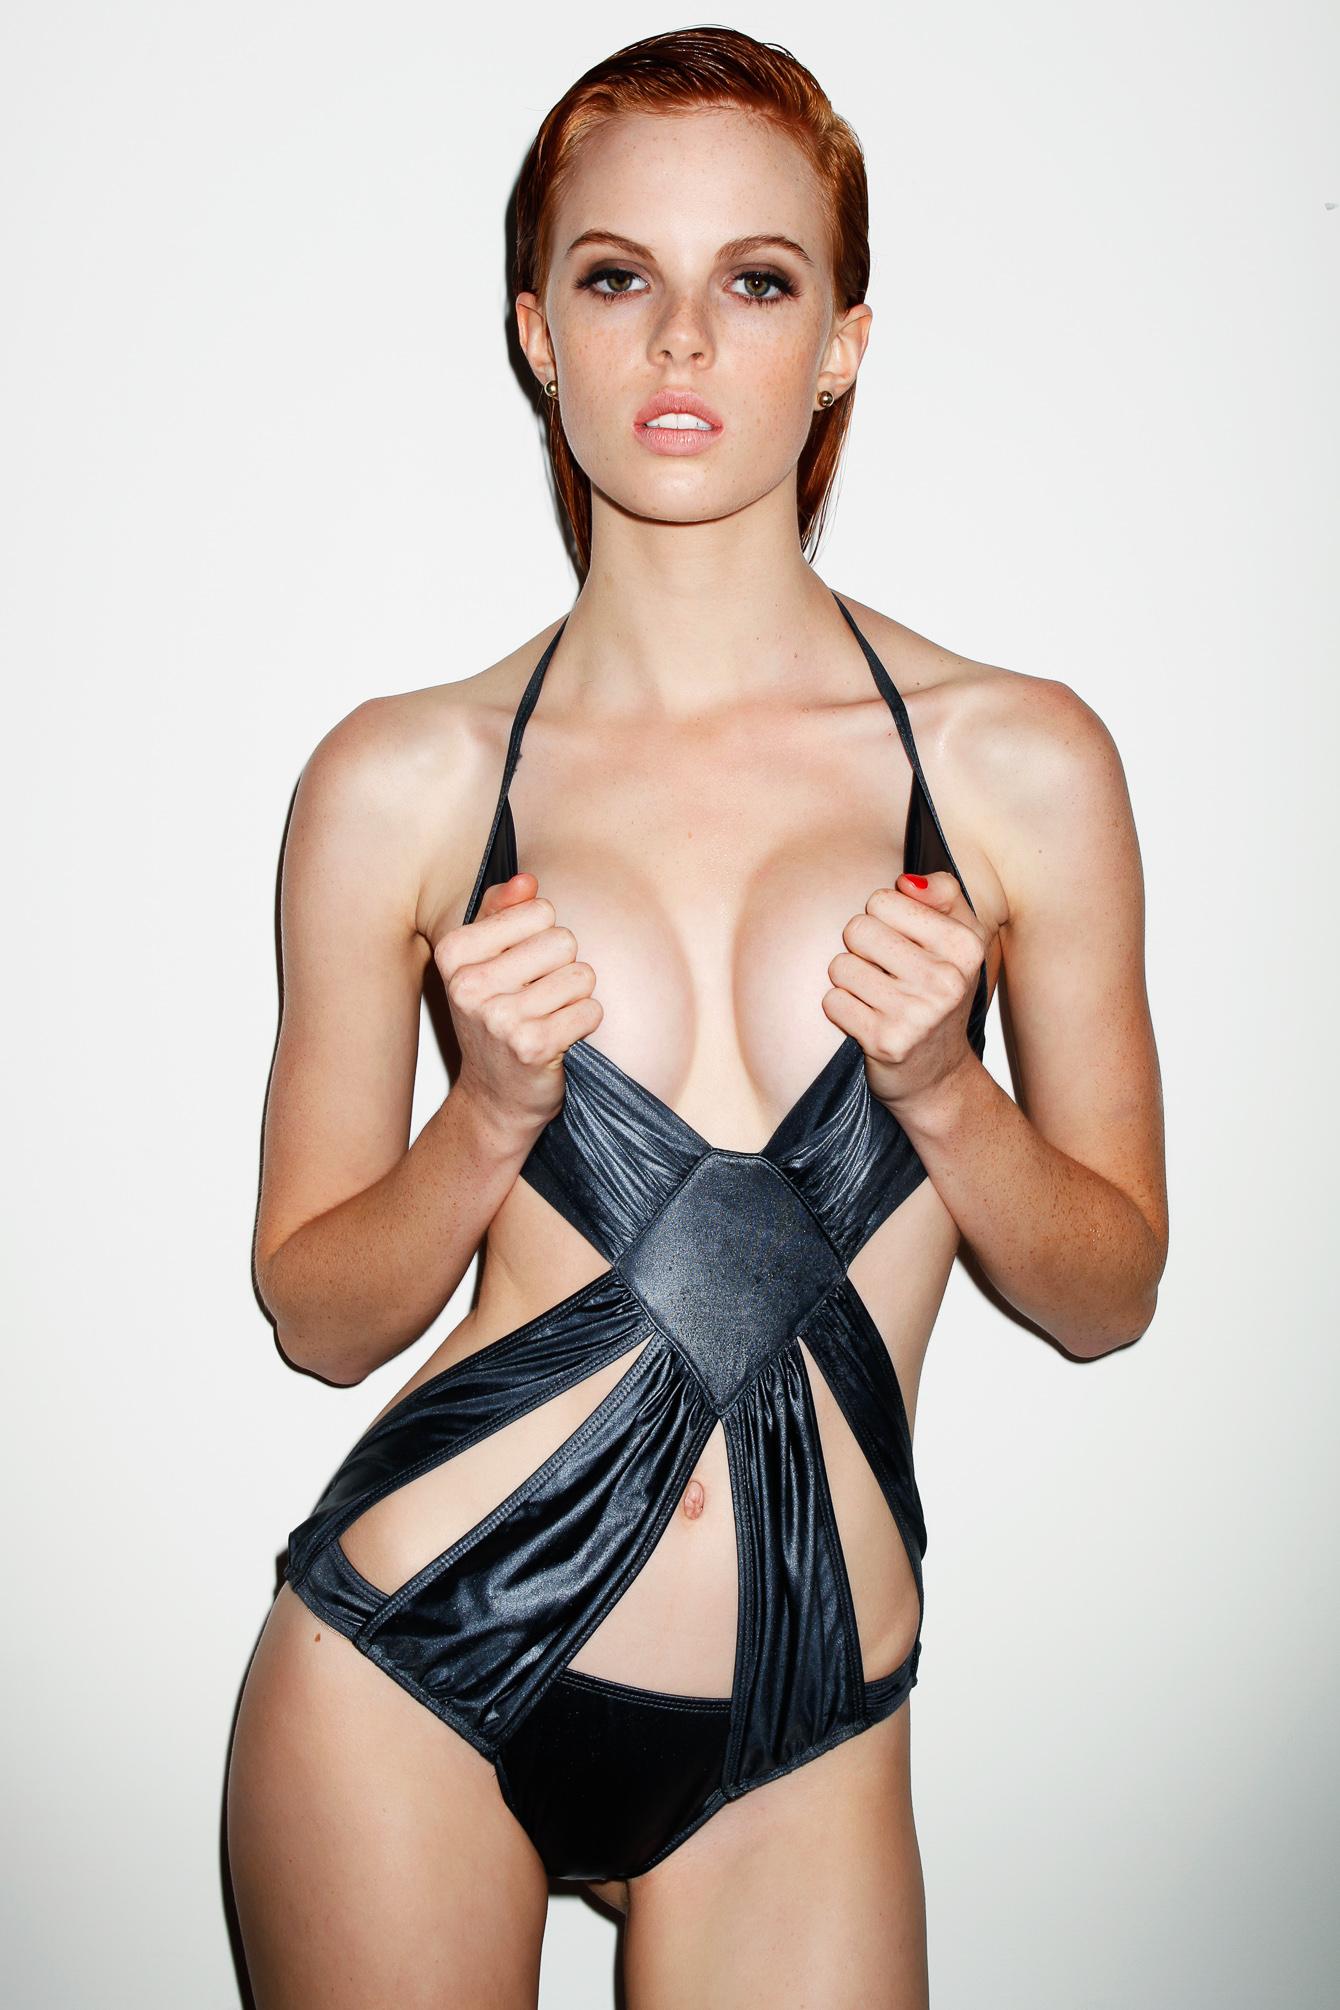 Rara anzai pussy,Meg turney cameltoe XXX video Scarlett Johansson Naked Photo Collection -,Hot photos